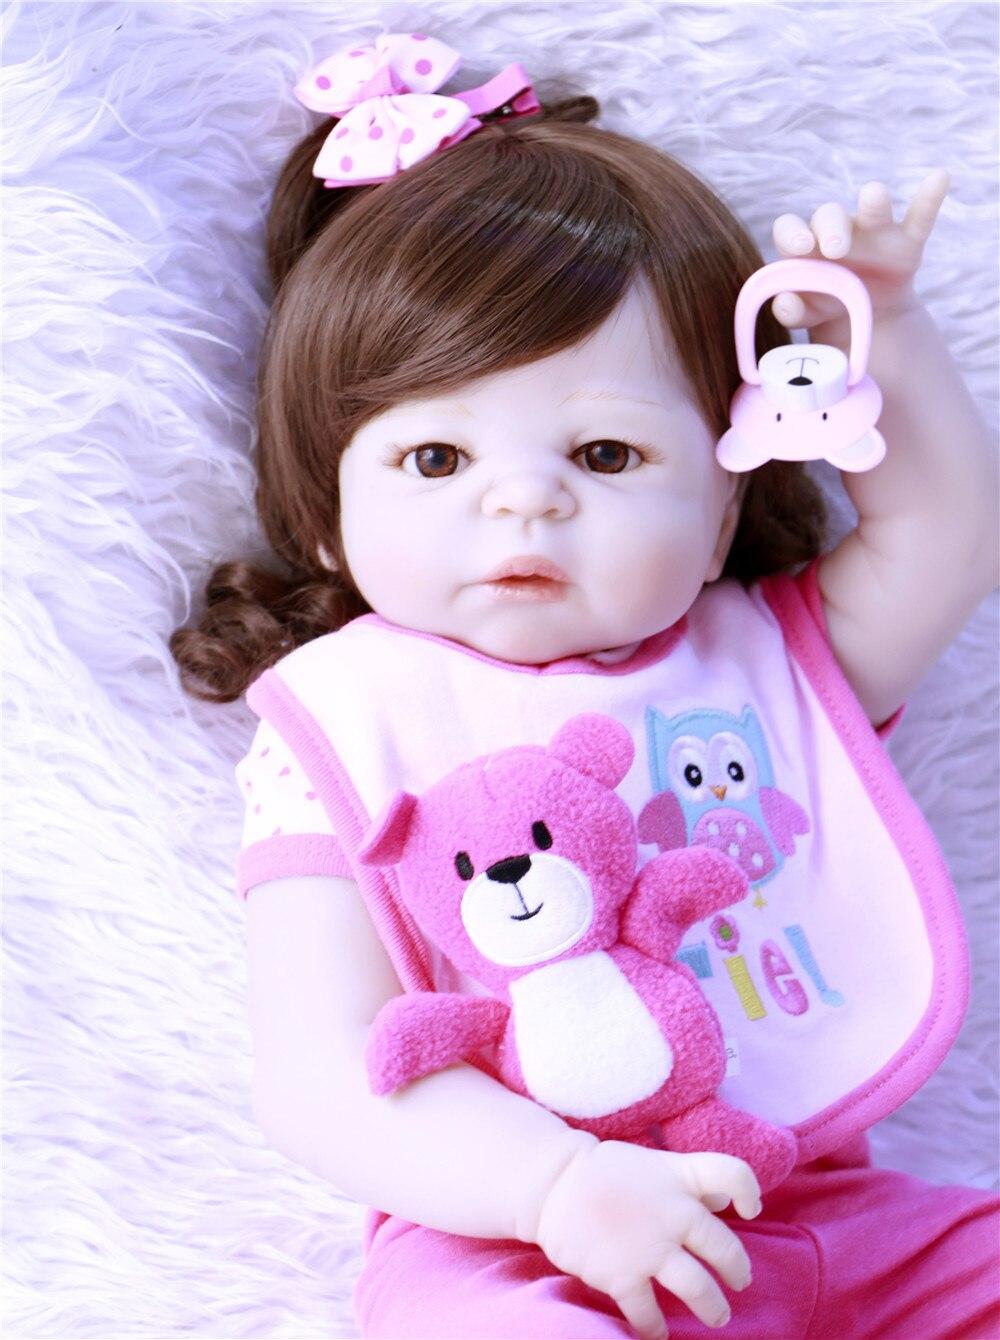 Toys & Hobbies Npk Real 57cm Full Body Silicone Girl Reborn Babies Doll Bath Toys Princess Babies Doll Wig Hair Birthday Gift Kids Brinquedos